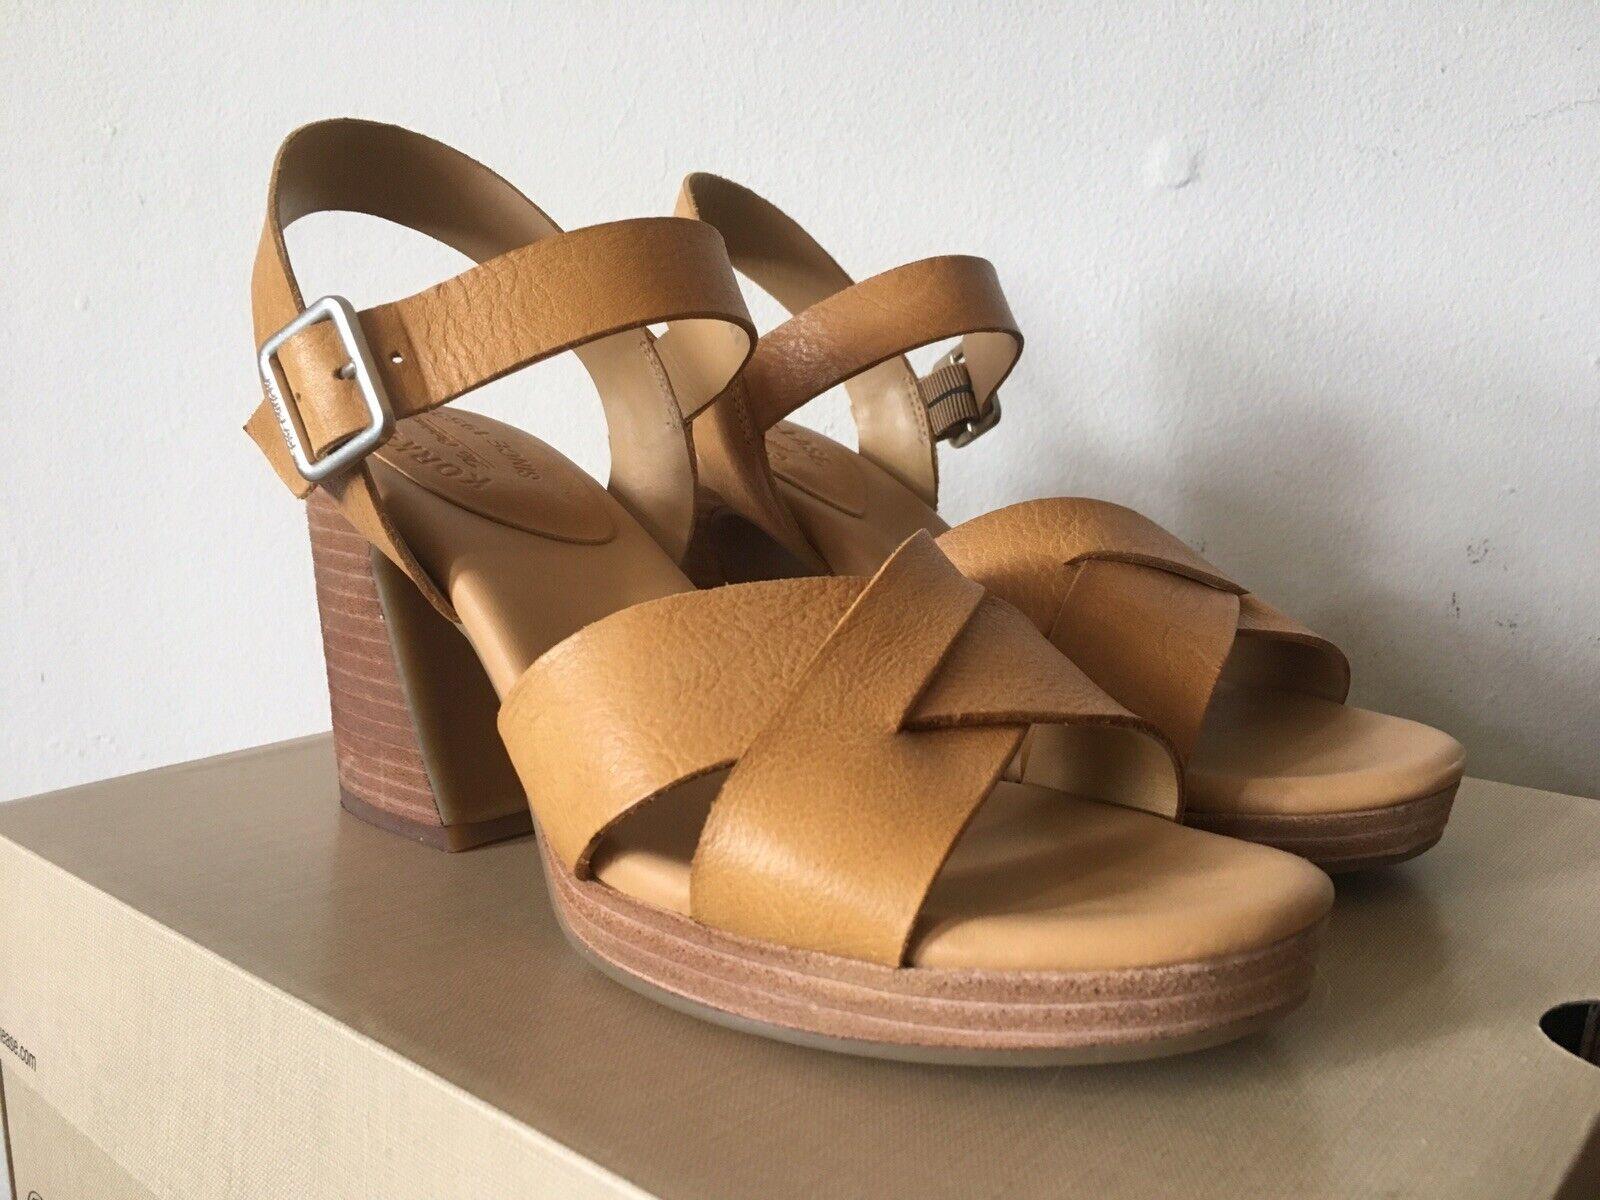 Kork  -Ease Kristjana Heeled Sandal Mexico giallo Leather Dimensione 9 - Worn Due volte  vendite online